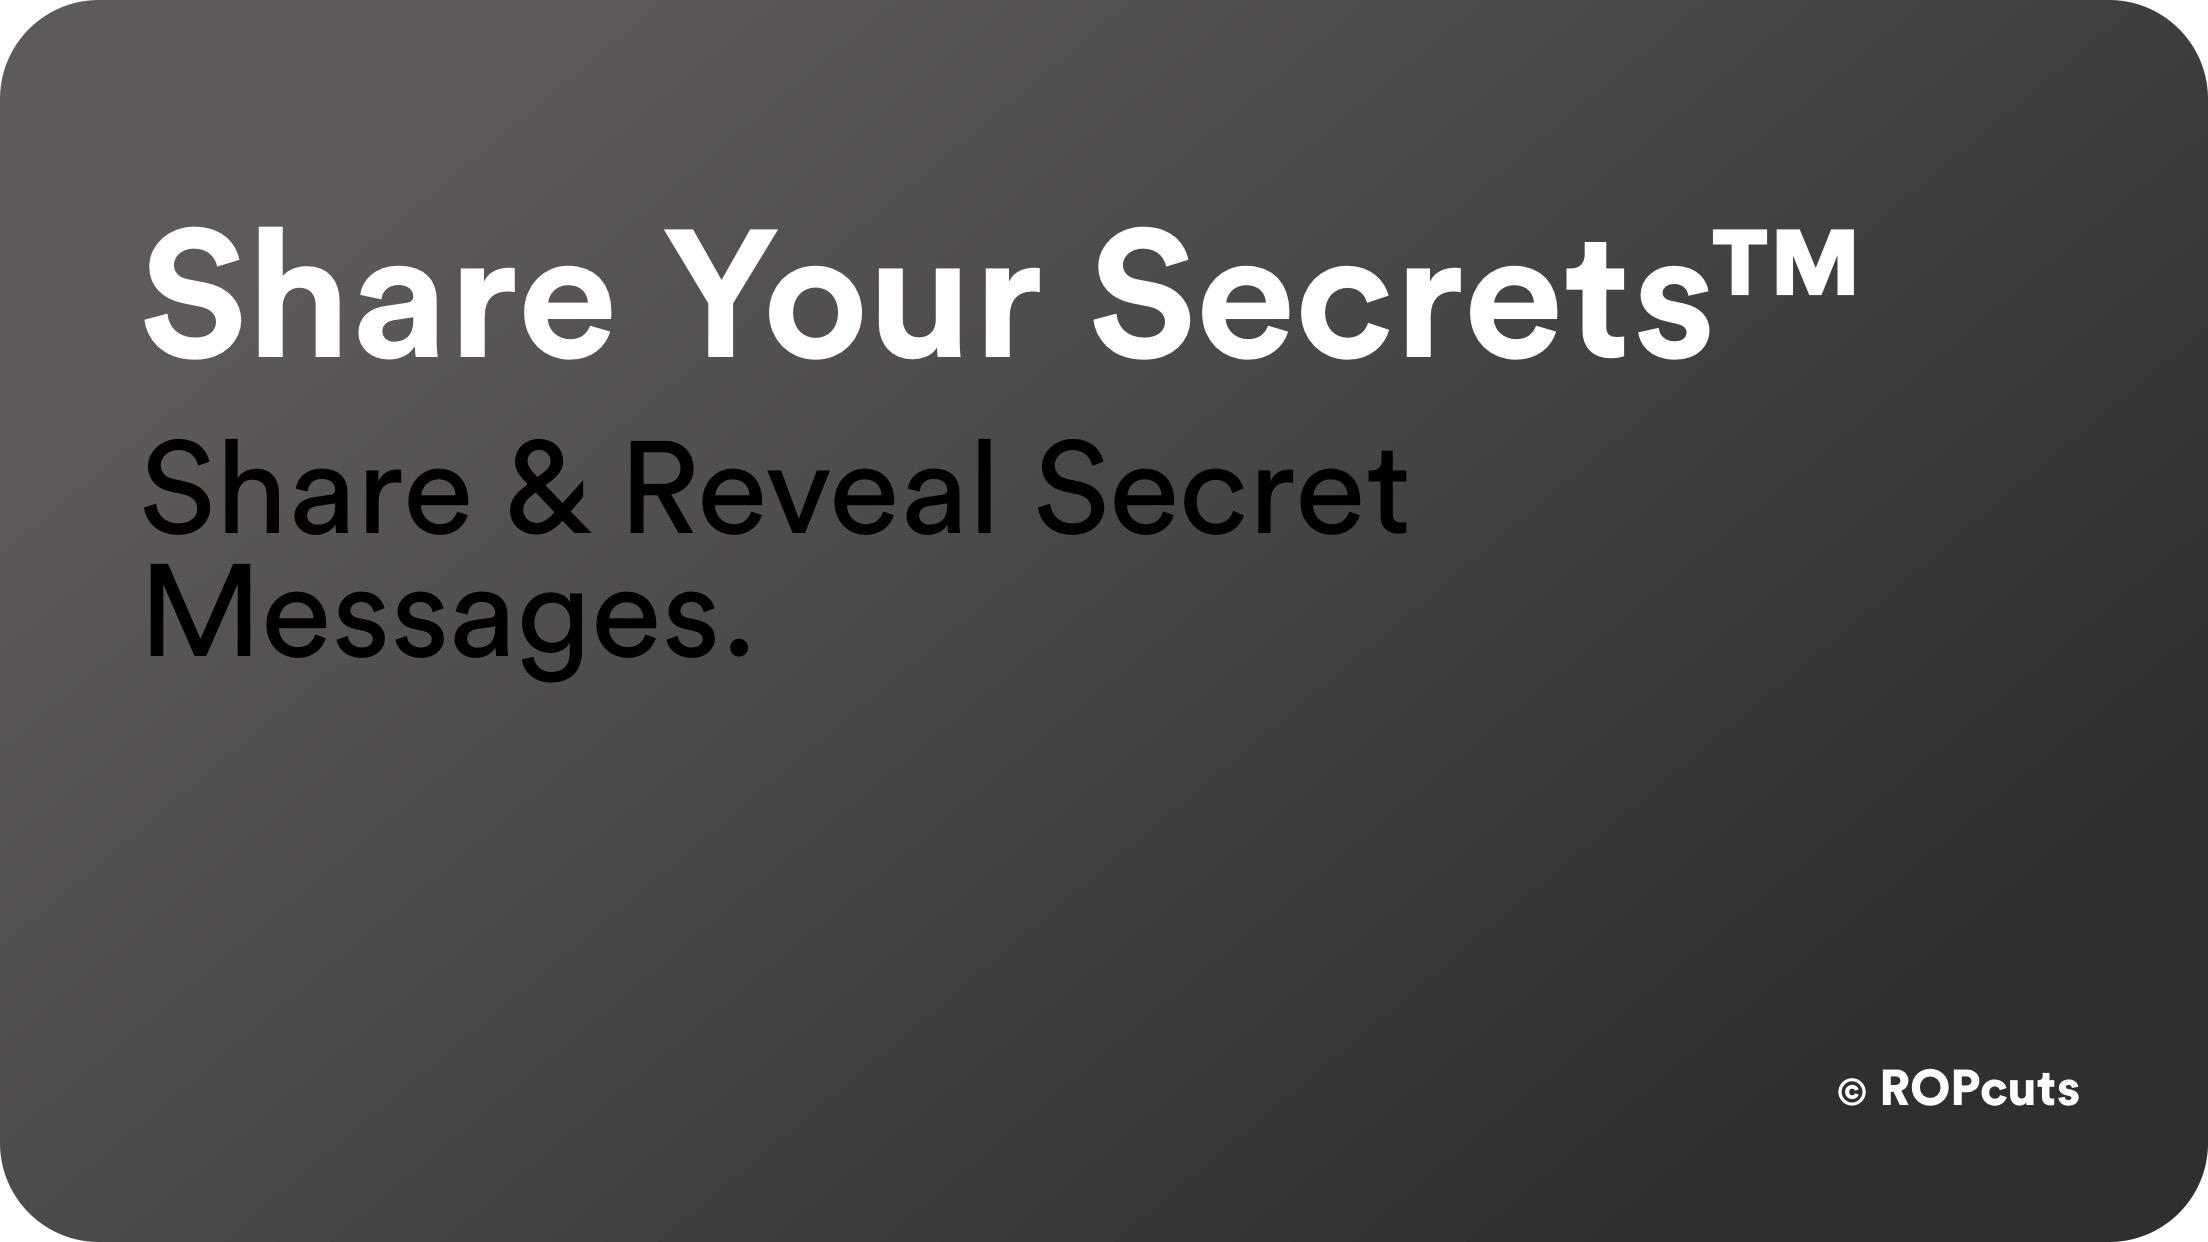 Share Your Secrets™